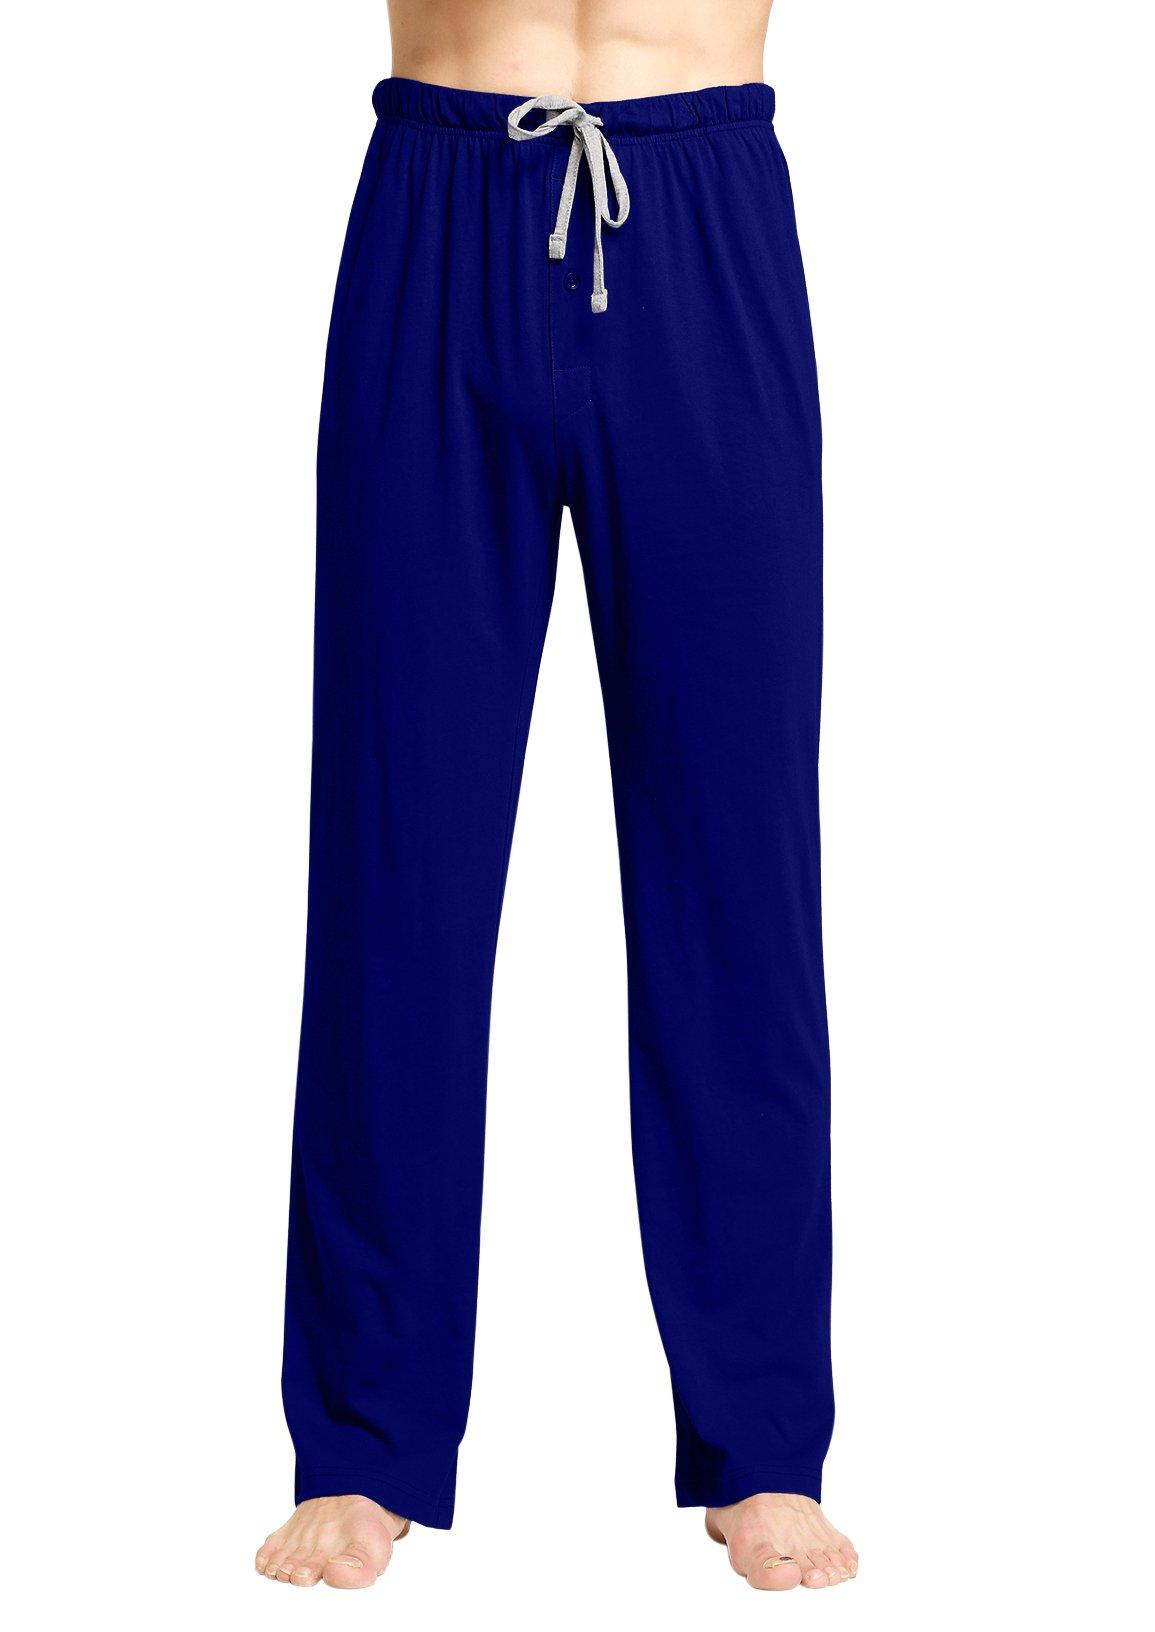 CYZ Cotton Knit Pajama Lounge Sleep Pants-Navy-M